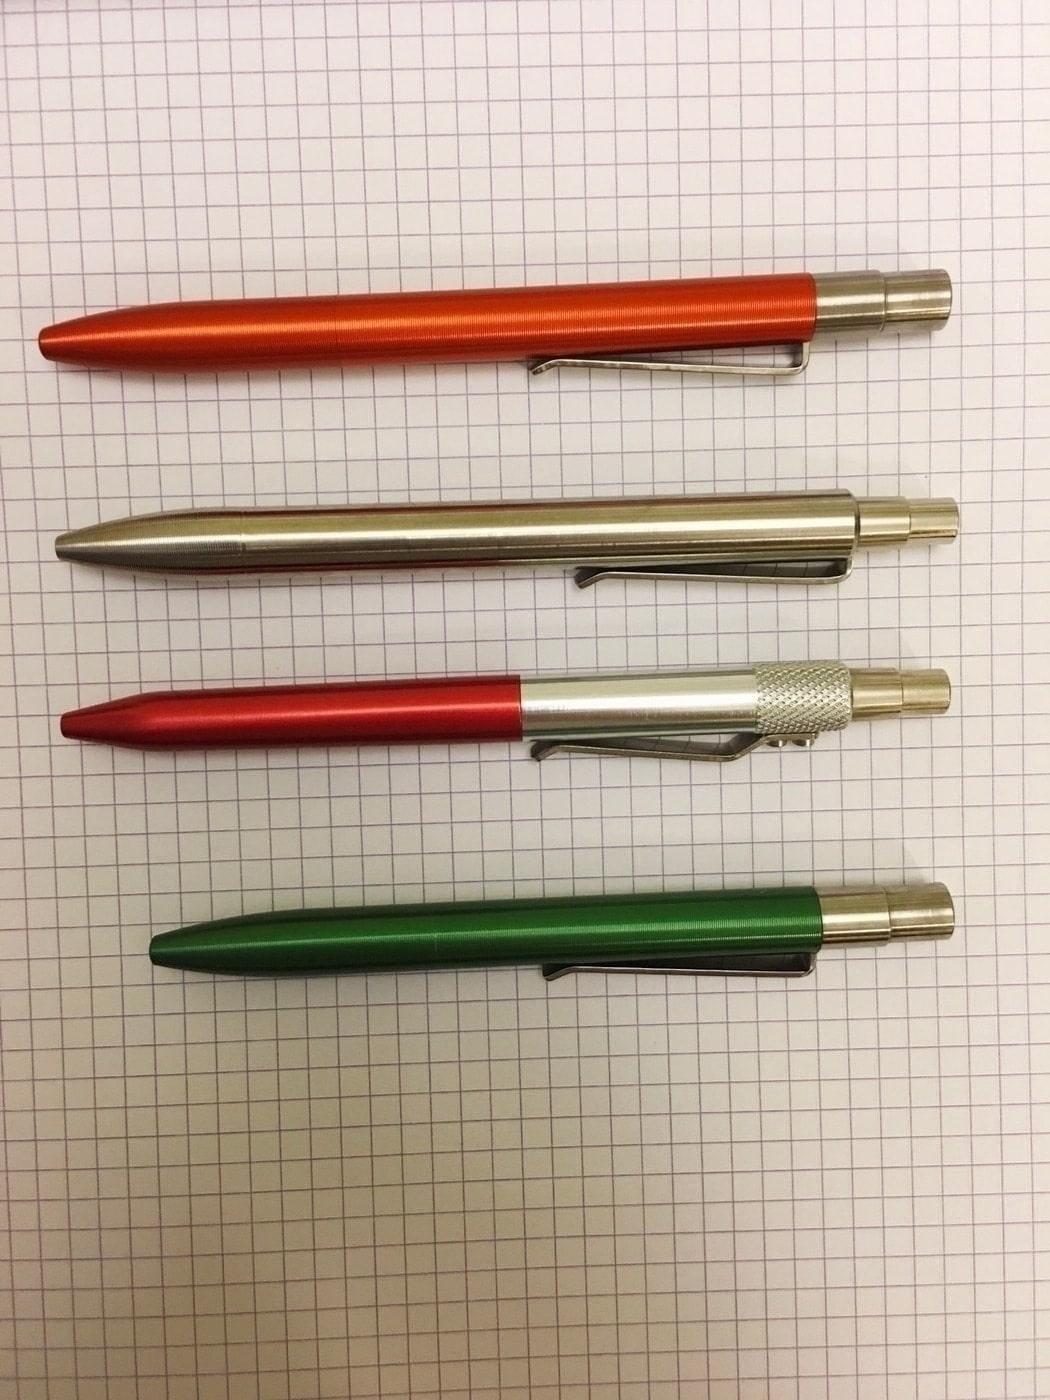 Top to Bottom: v2 Mover, v1 Mover, Karas Kustoms Retrakt, v2 Shaker